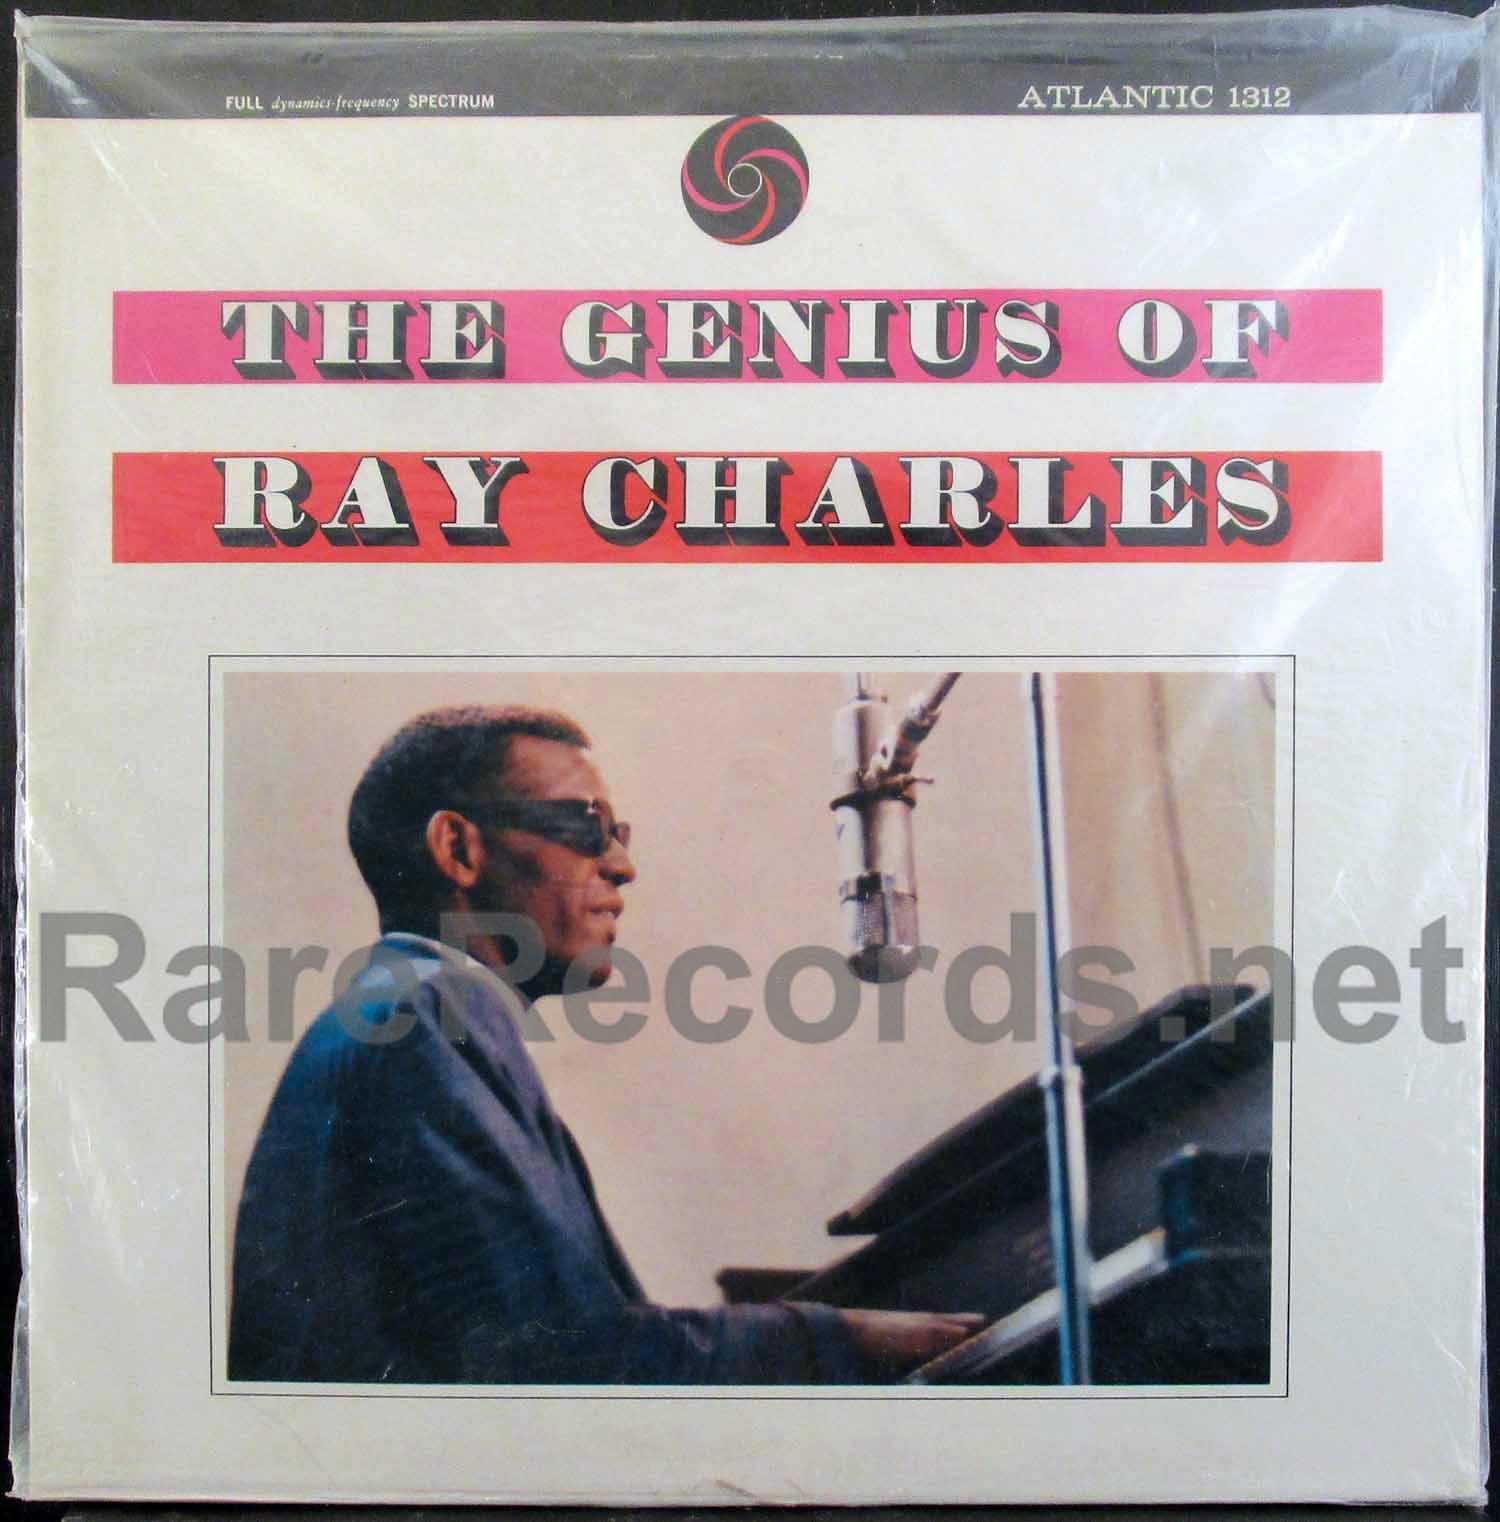 ray charles - the genius of ray charles U.S. lp